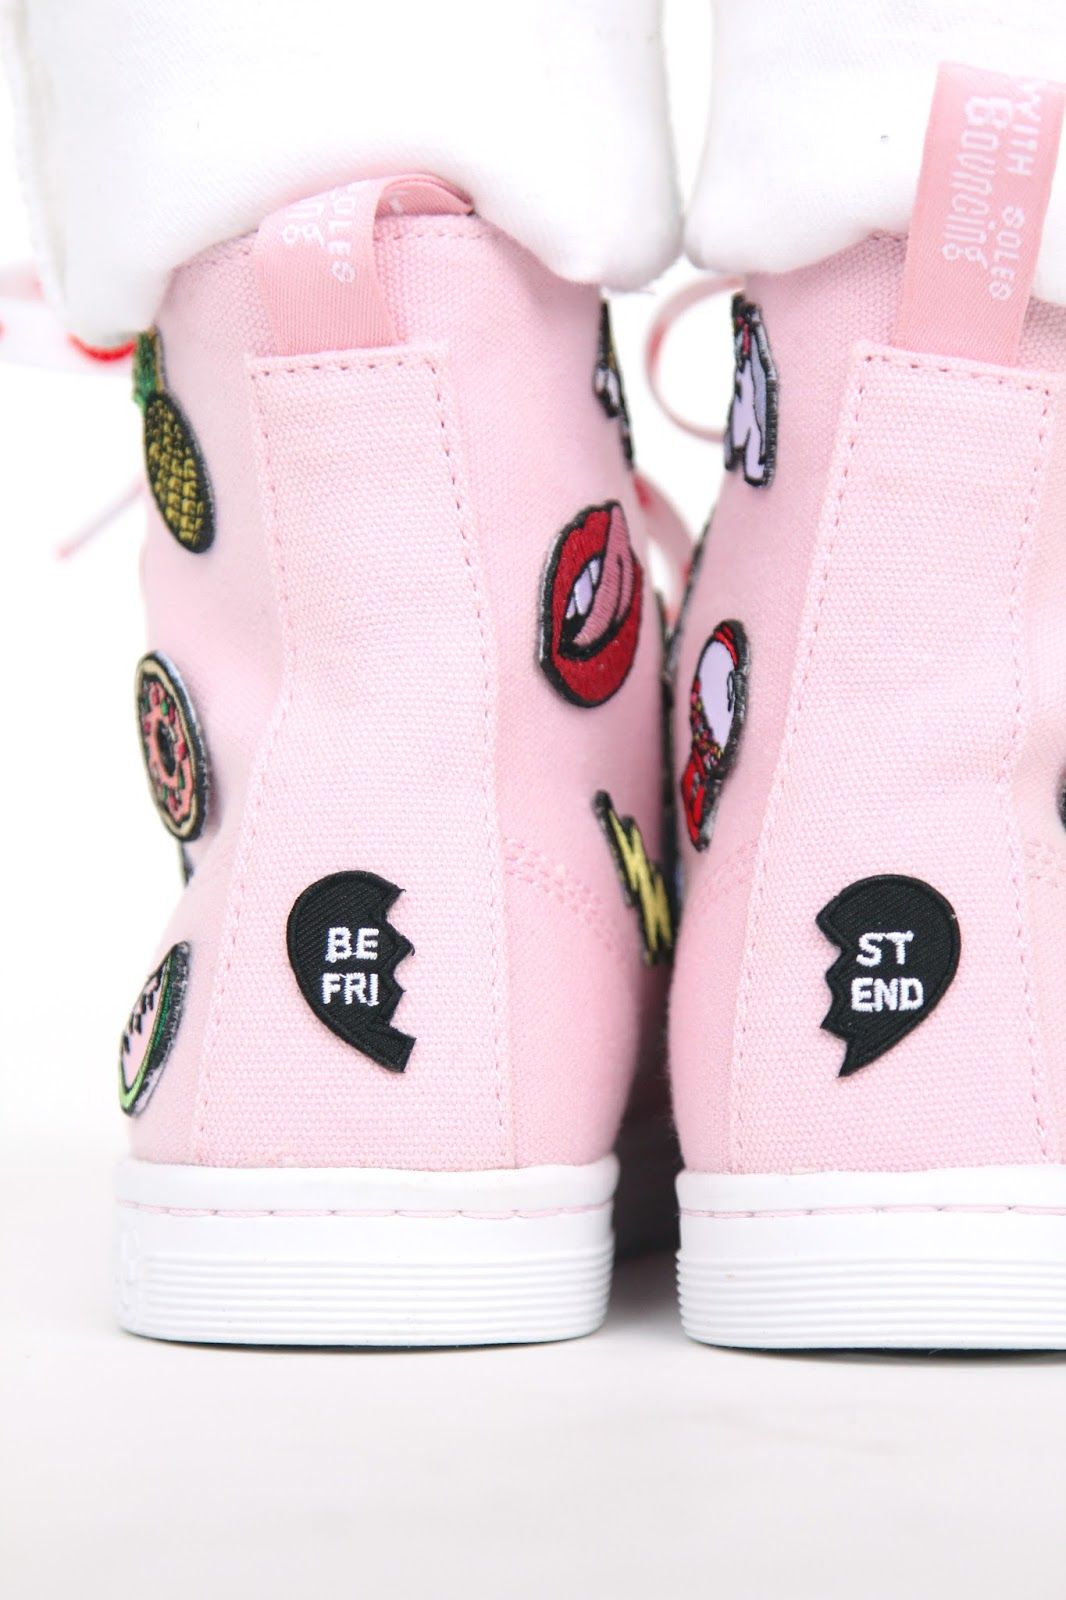 41d732da75bd1 DIY Patch Patterned Sneakers